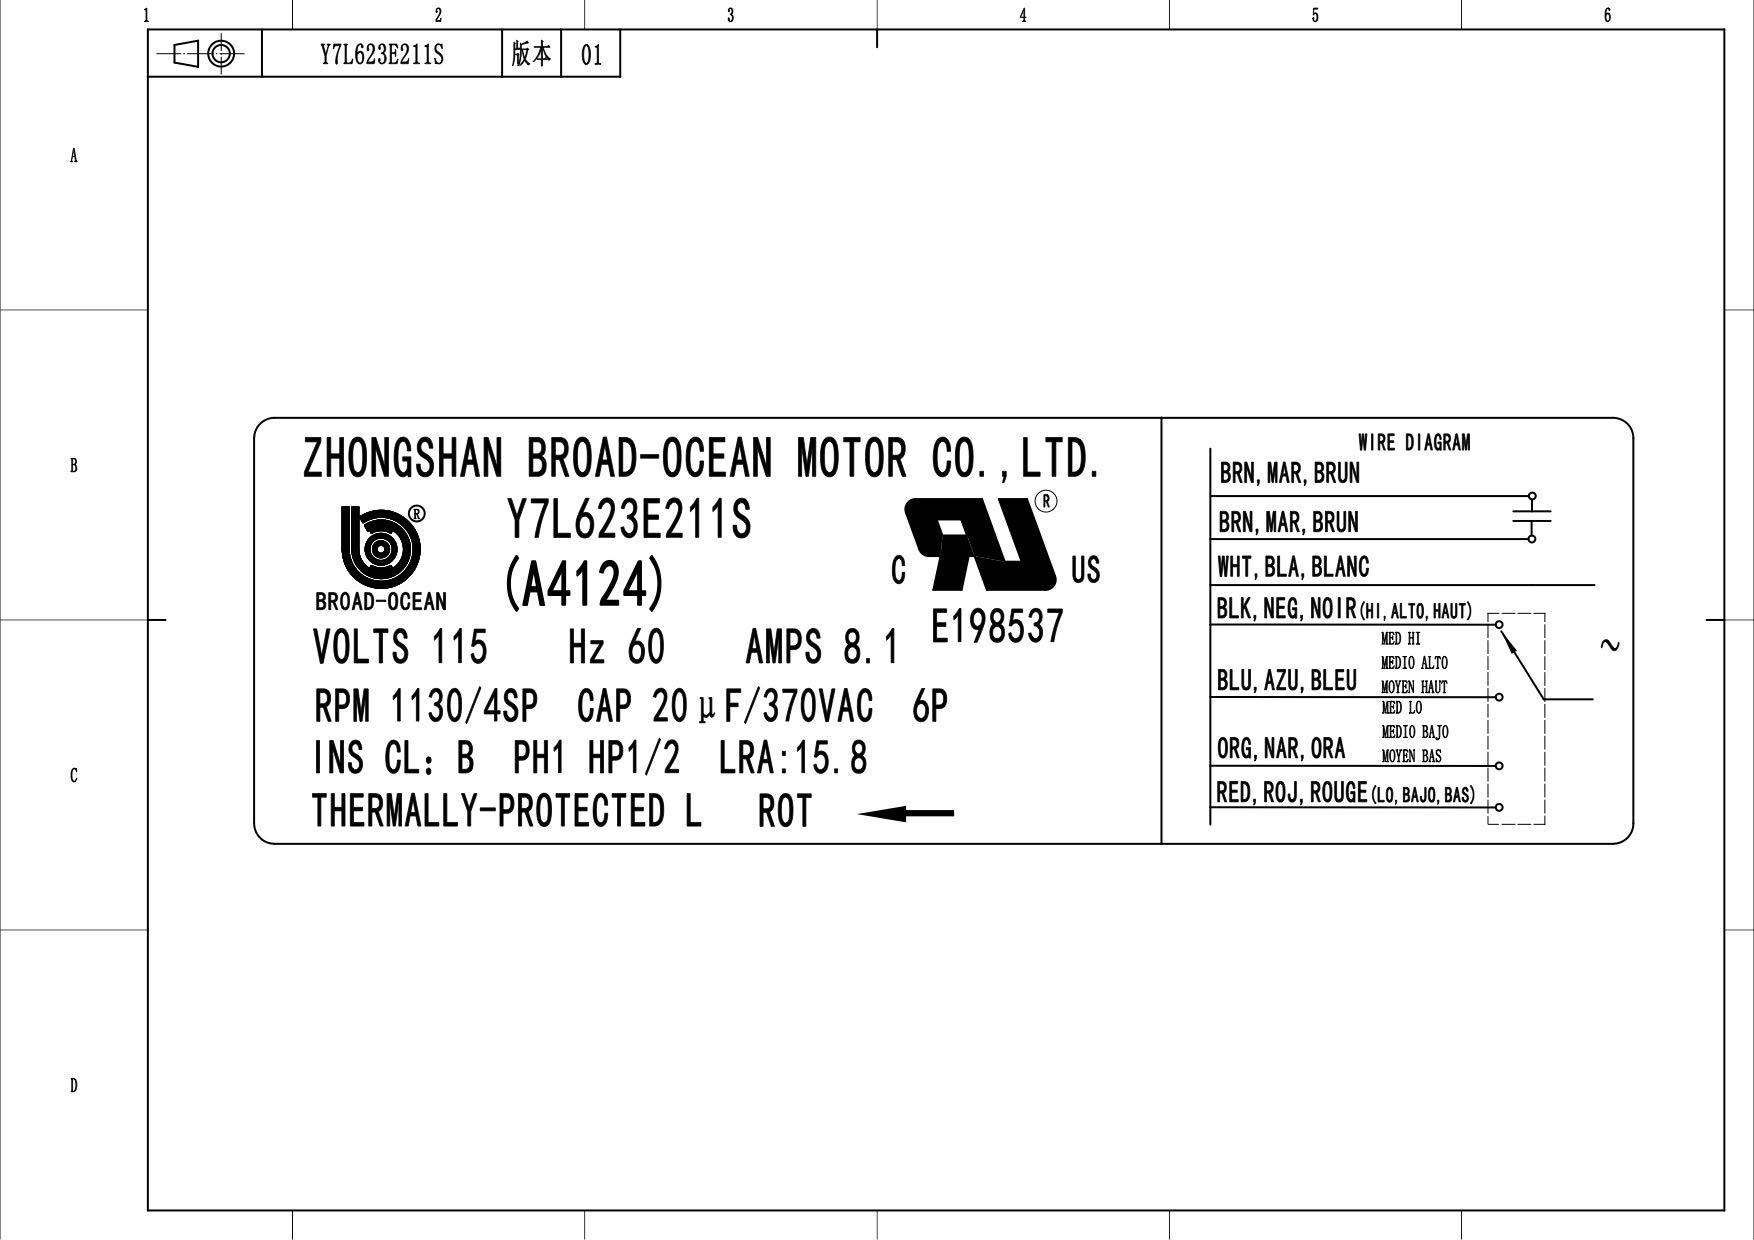 Zhongshan Broad Ocean Motor Wiring Diagram from m.media-amazon.com